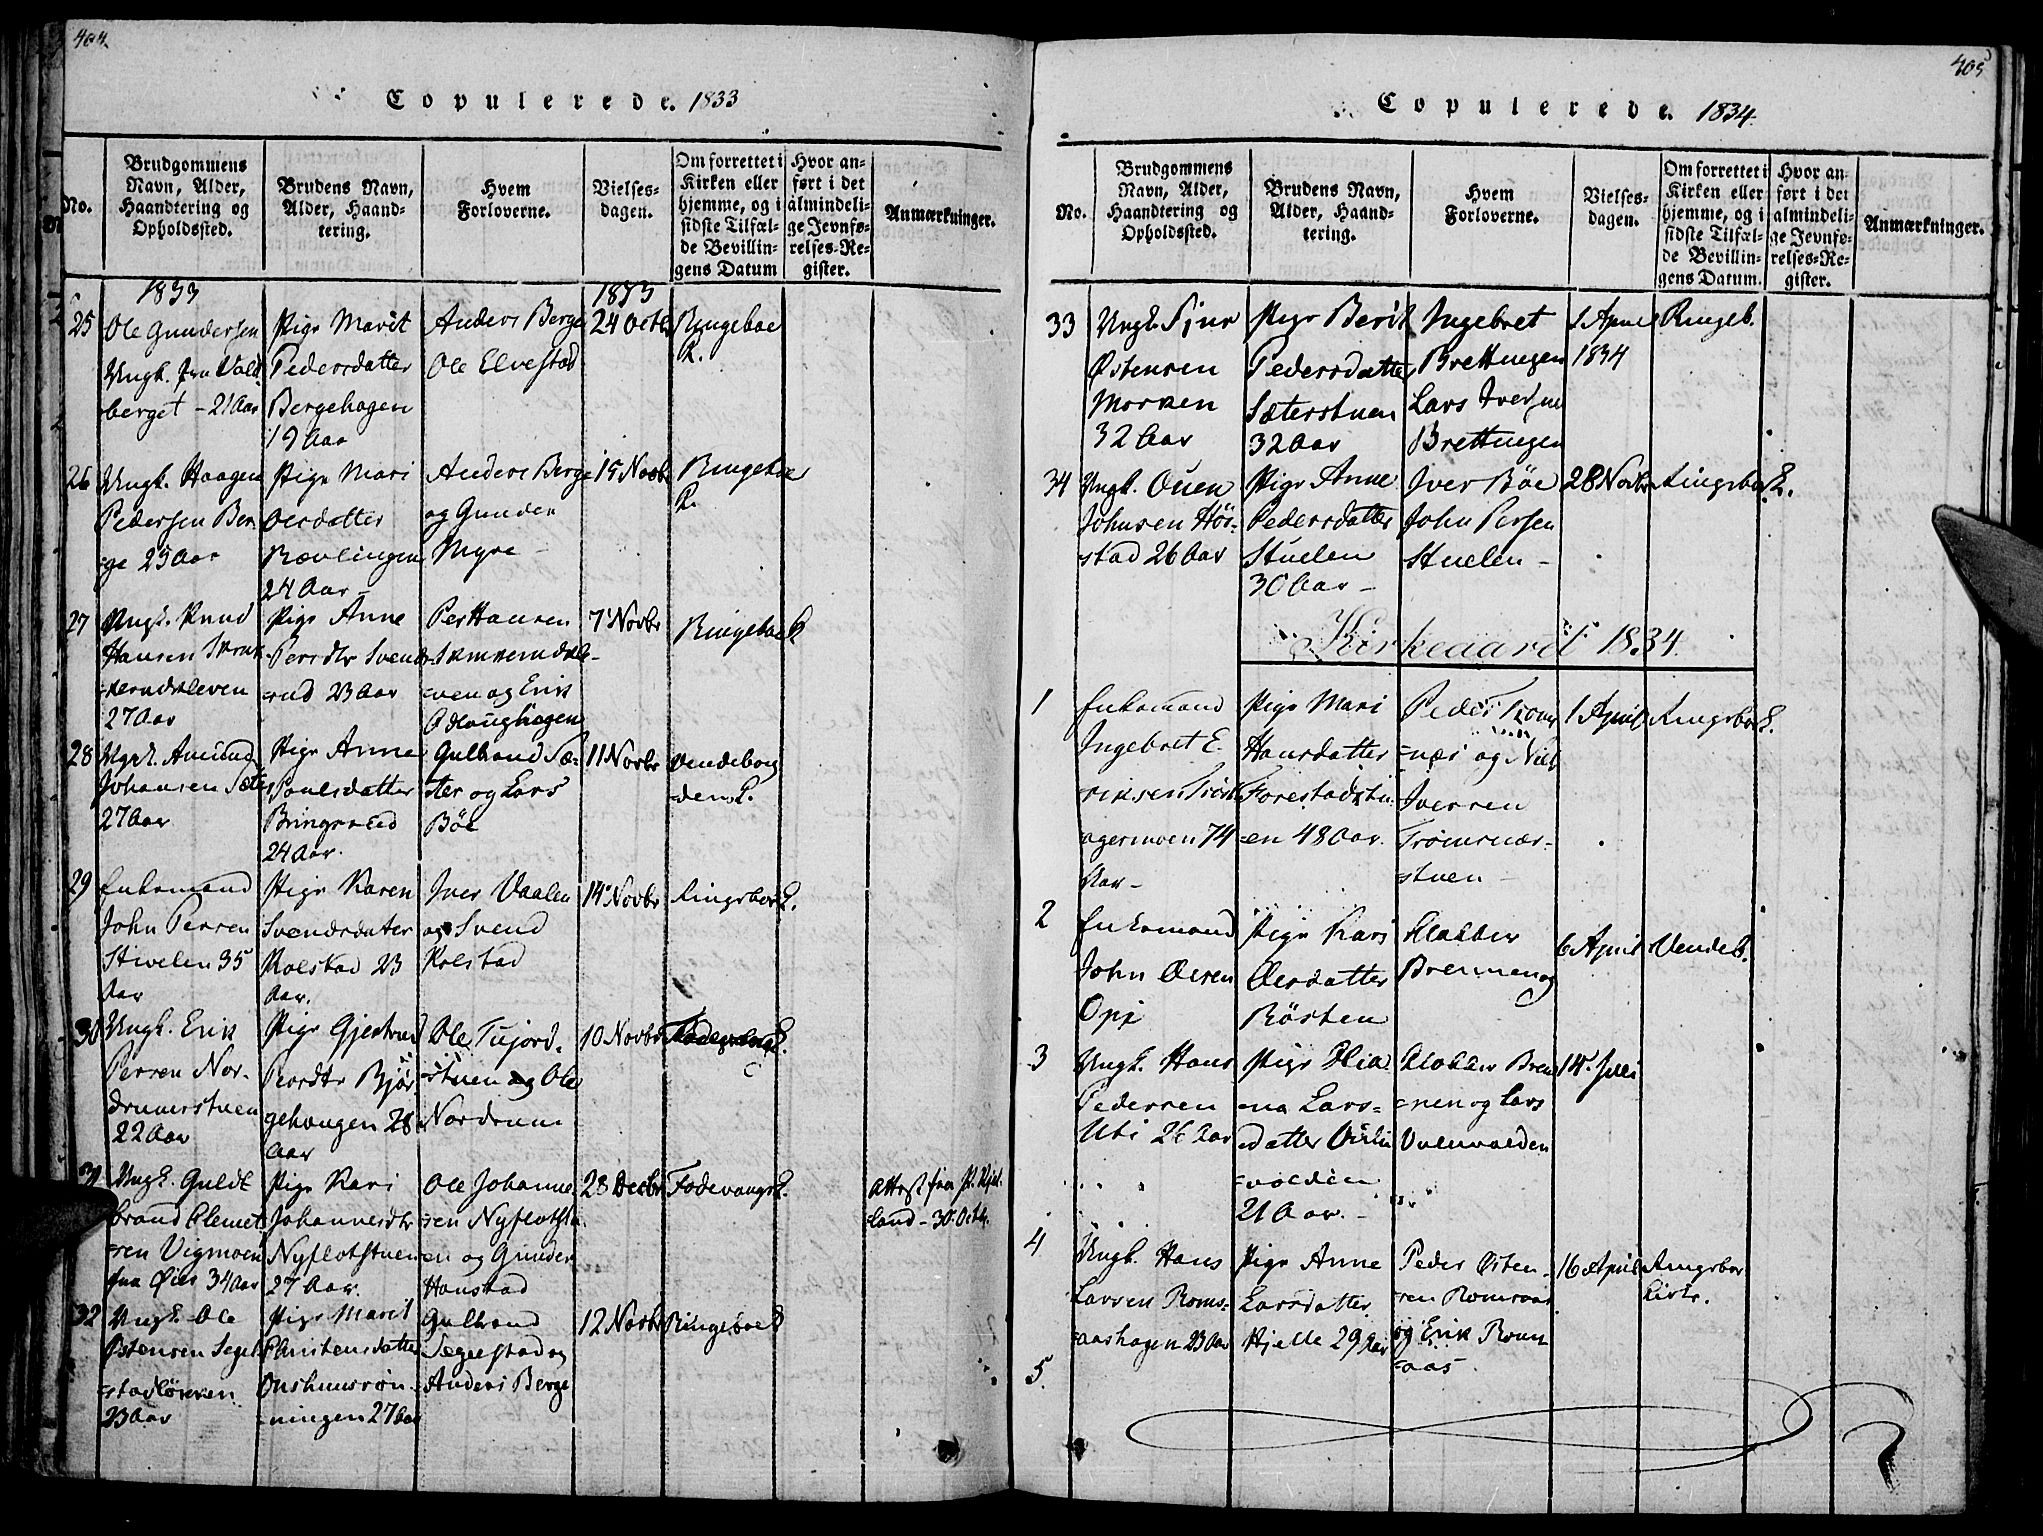 SAH, Ringebu prestekontor, Ministerialbok nr. 4, 1821-1839, s. 404-405